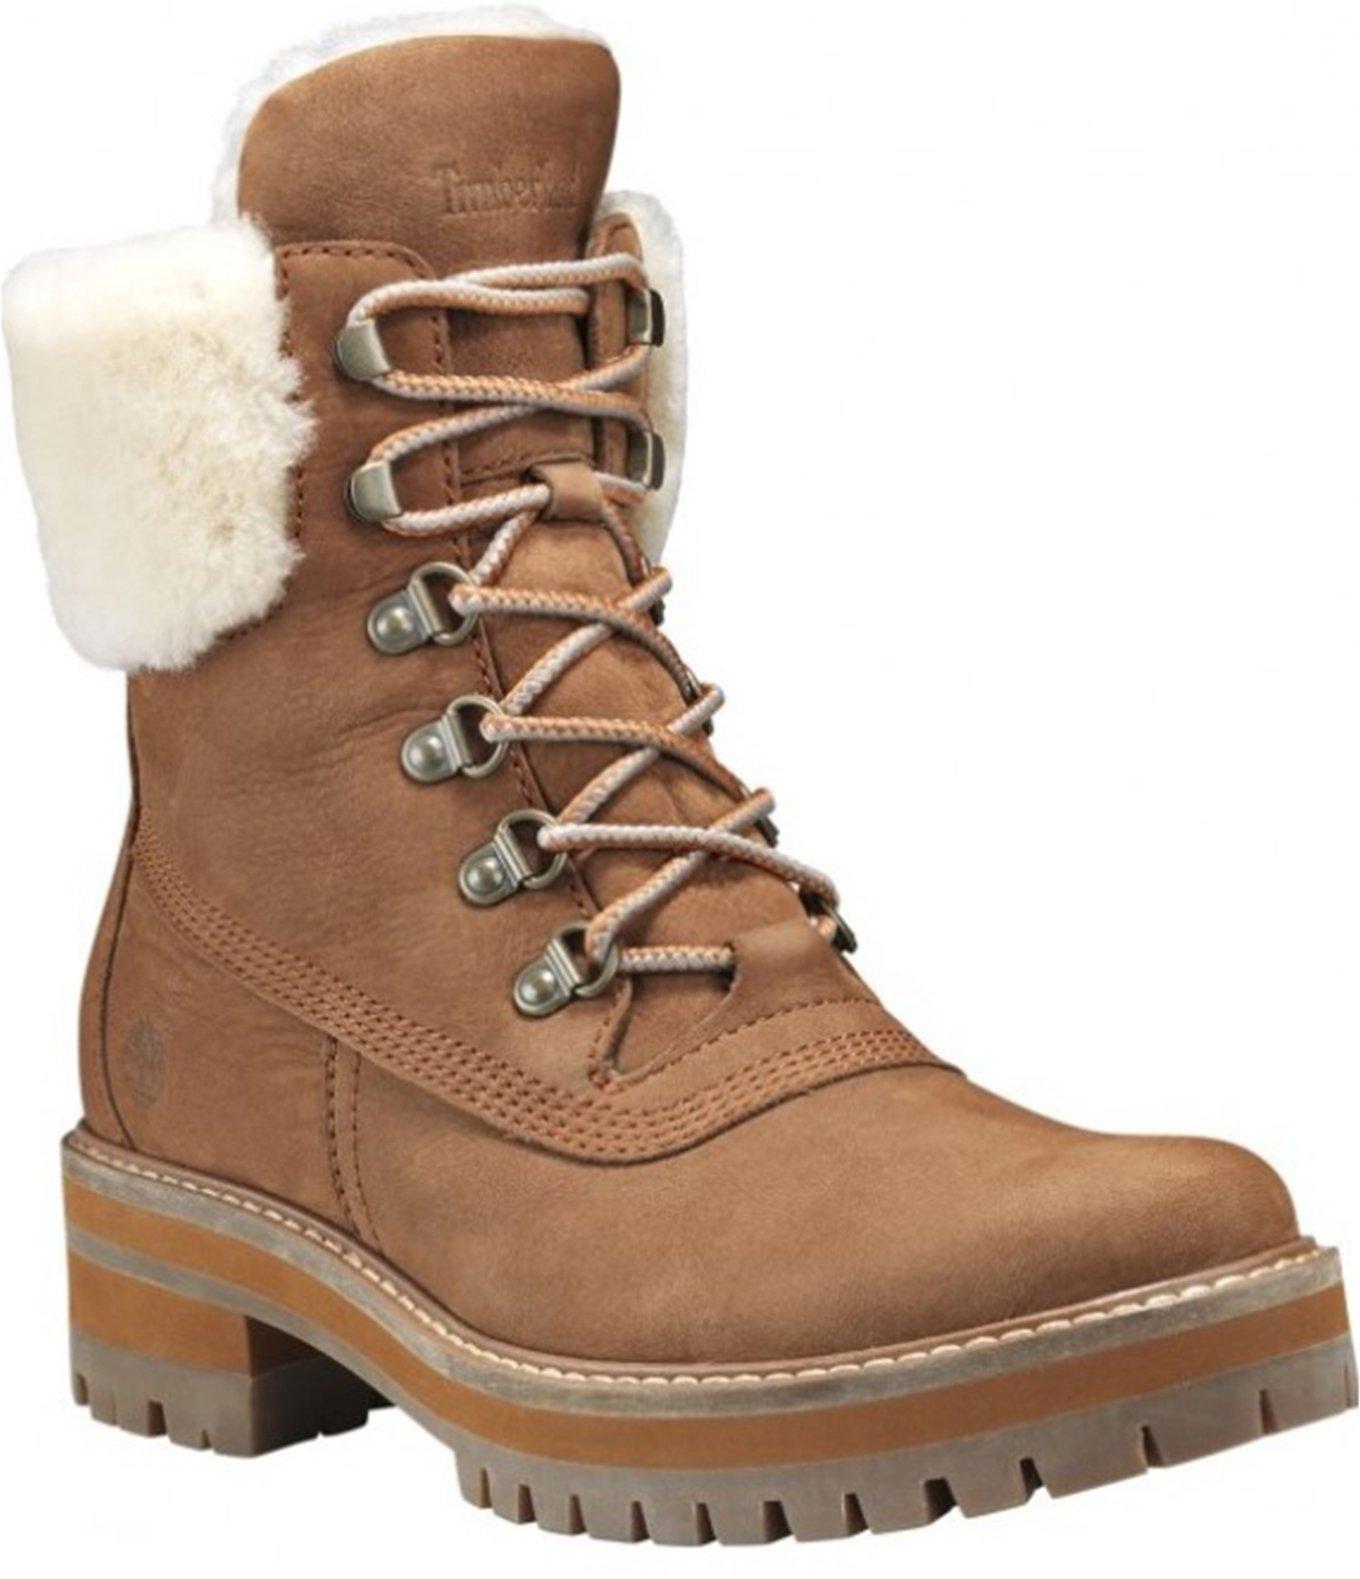 Timberland Courmayeur Valley Shearling Boots